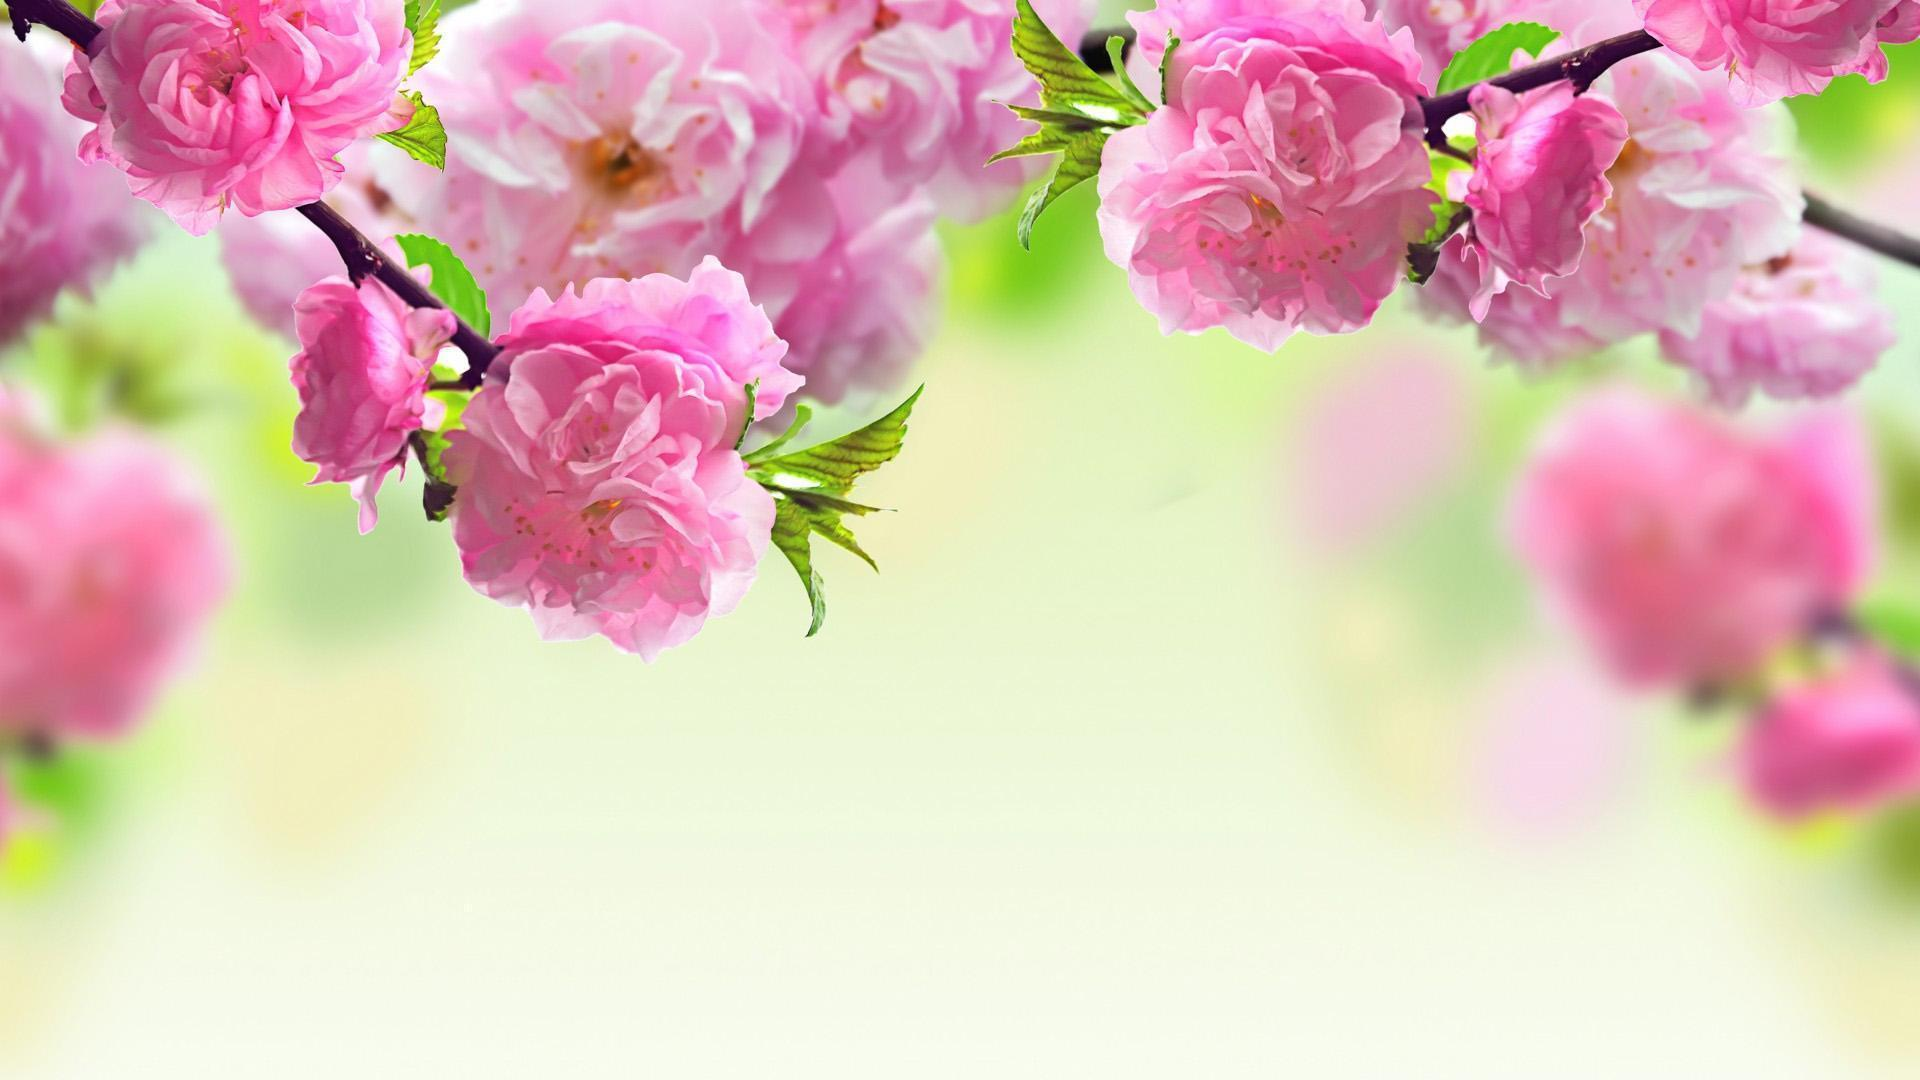 HD Spring Wallpapers For Desktop Wallpaper